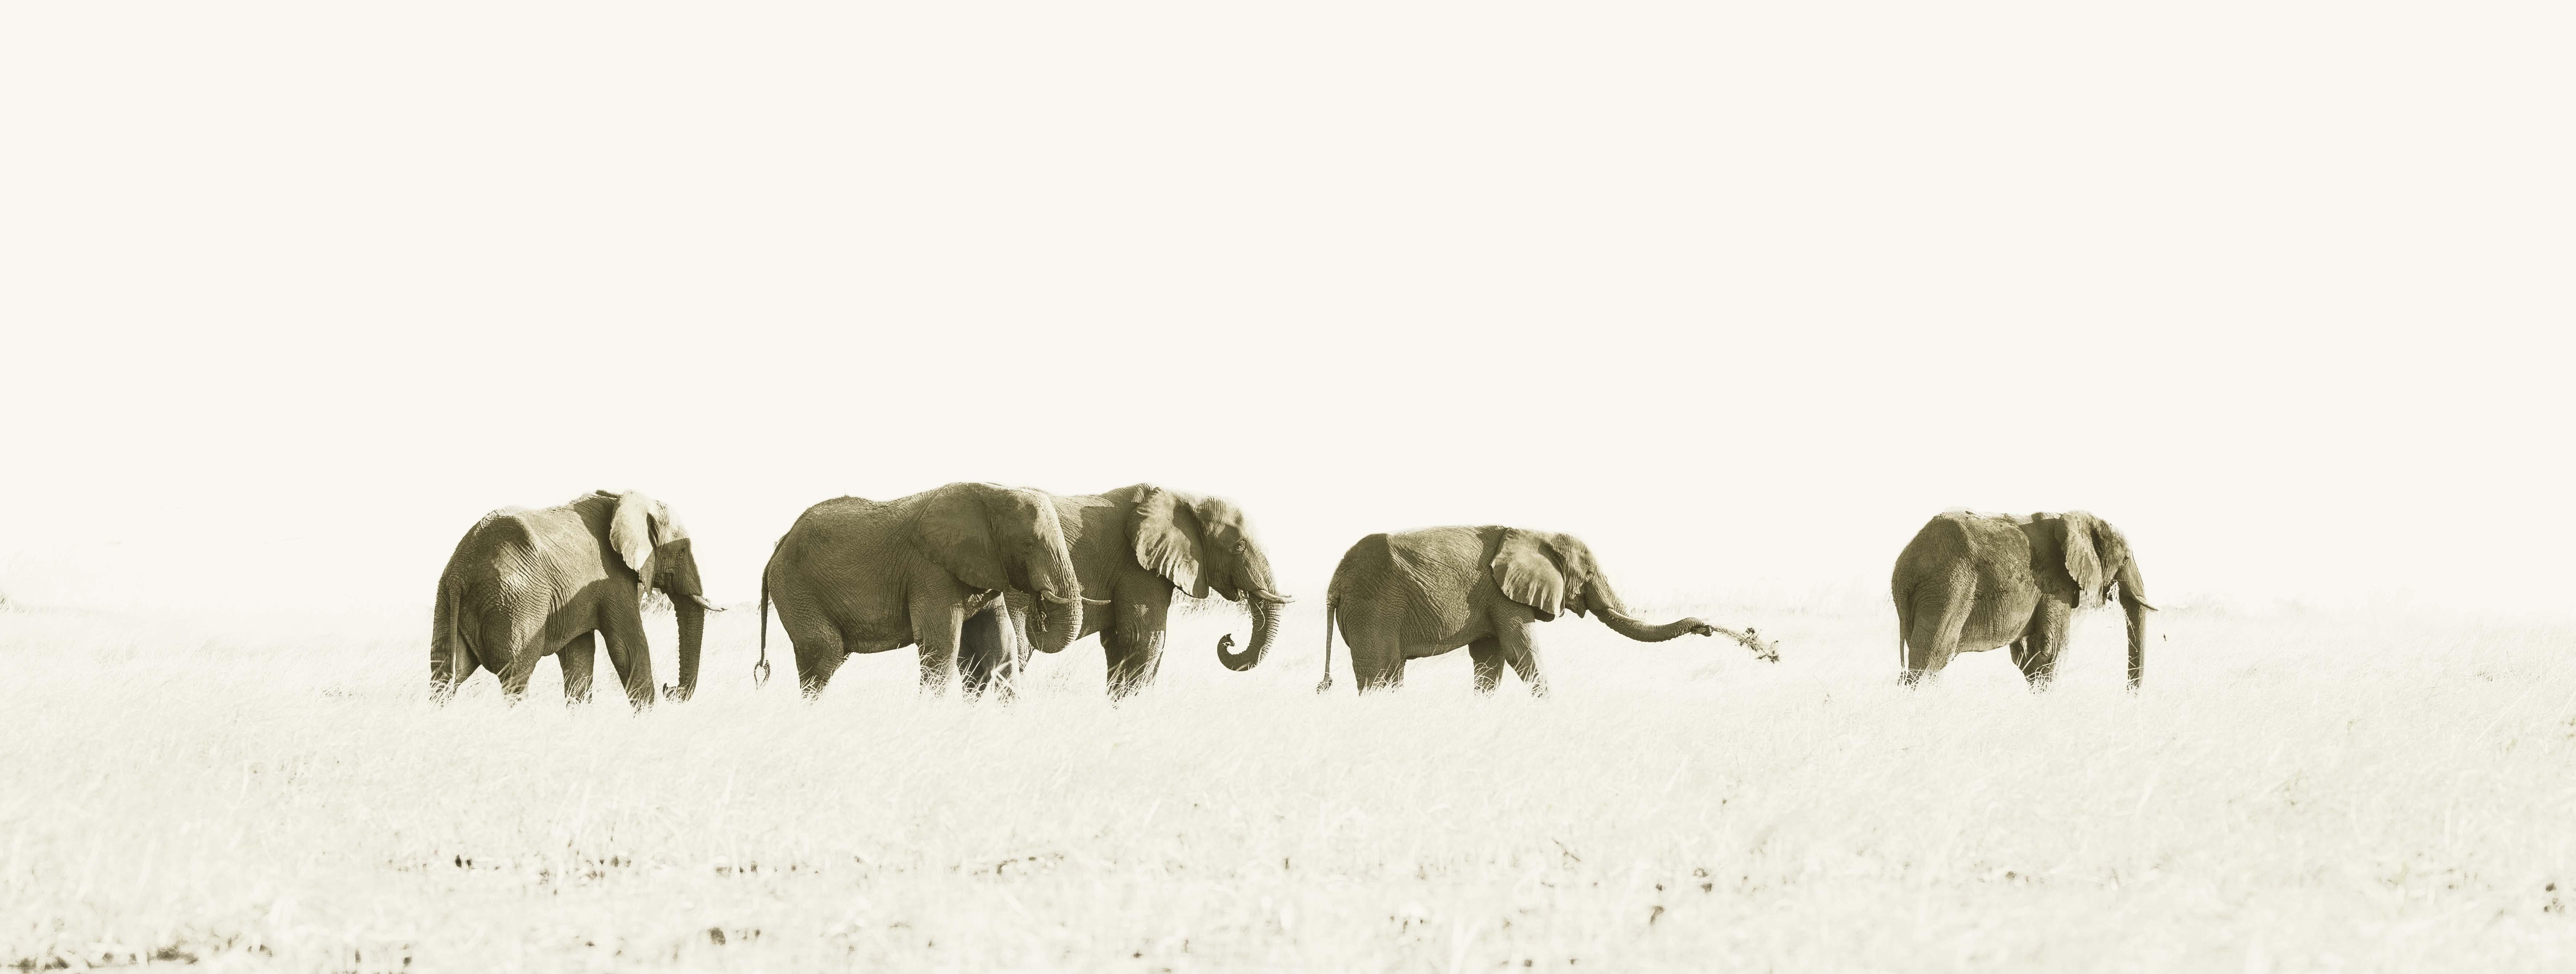 Elefantes linea